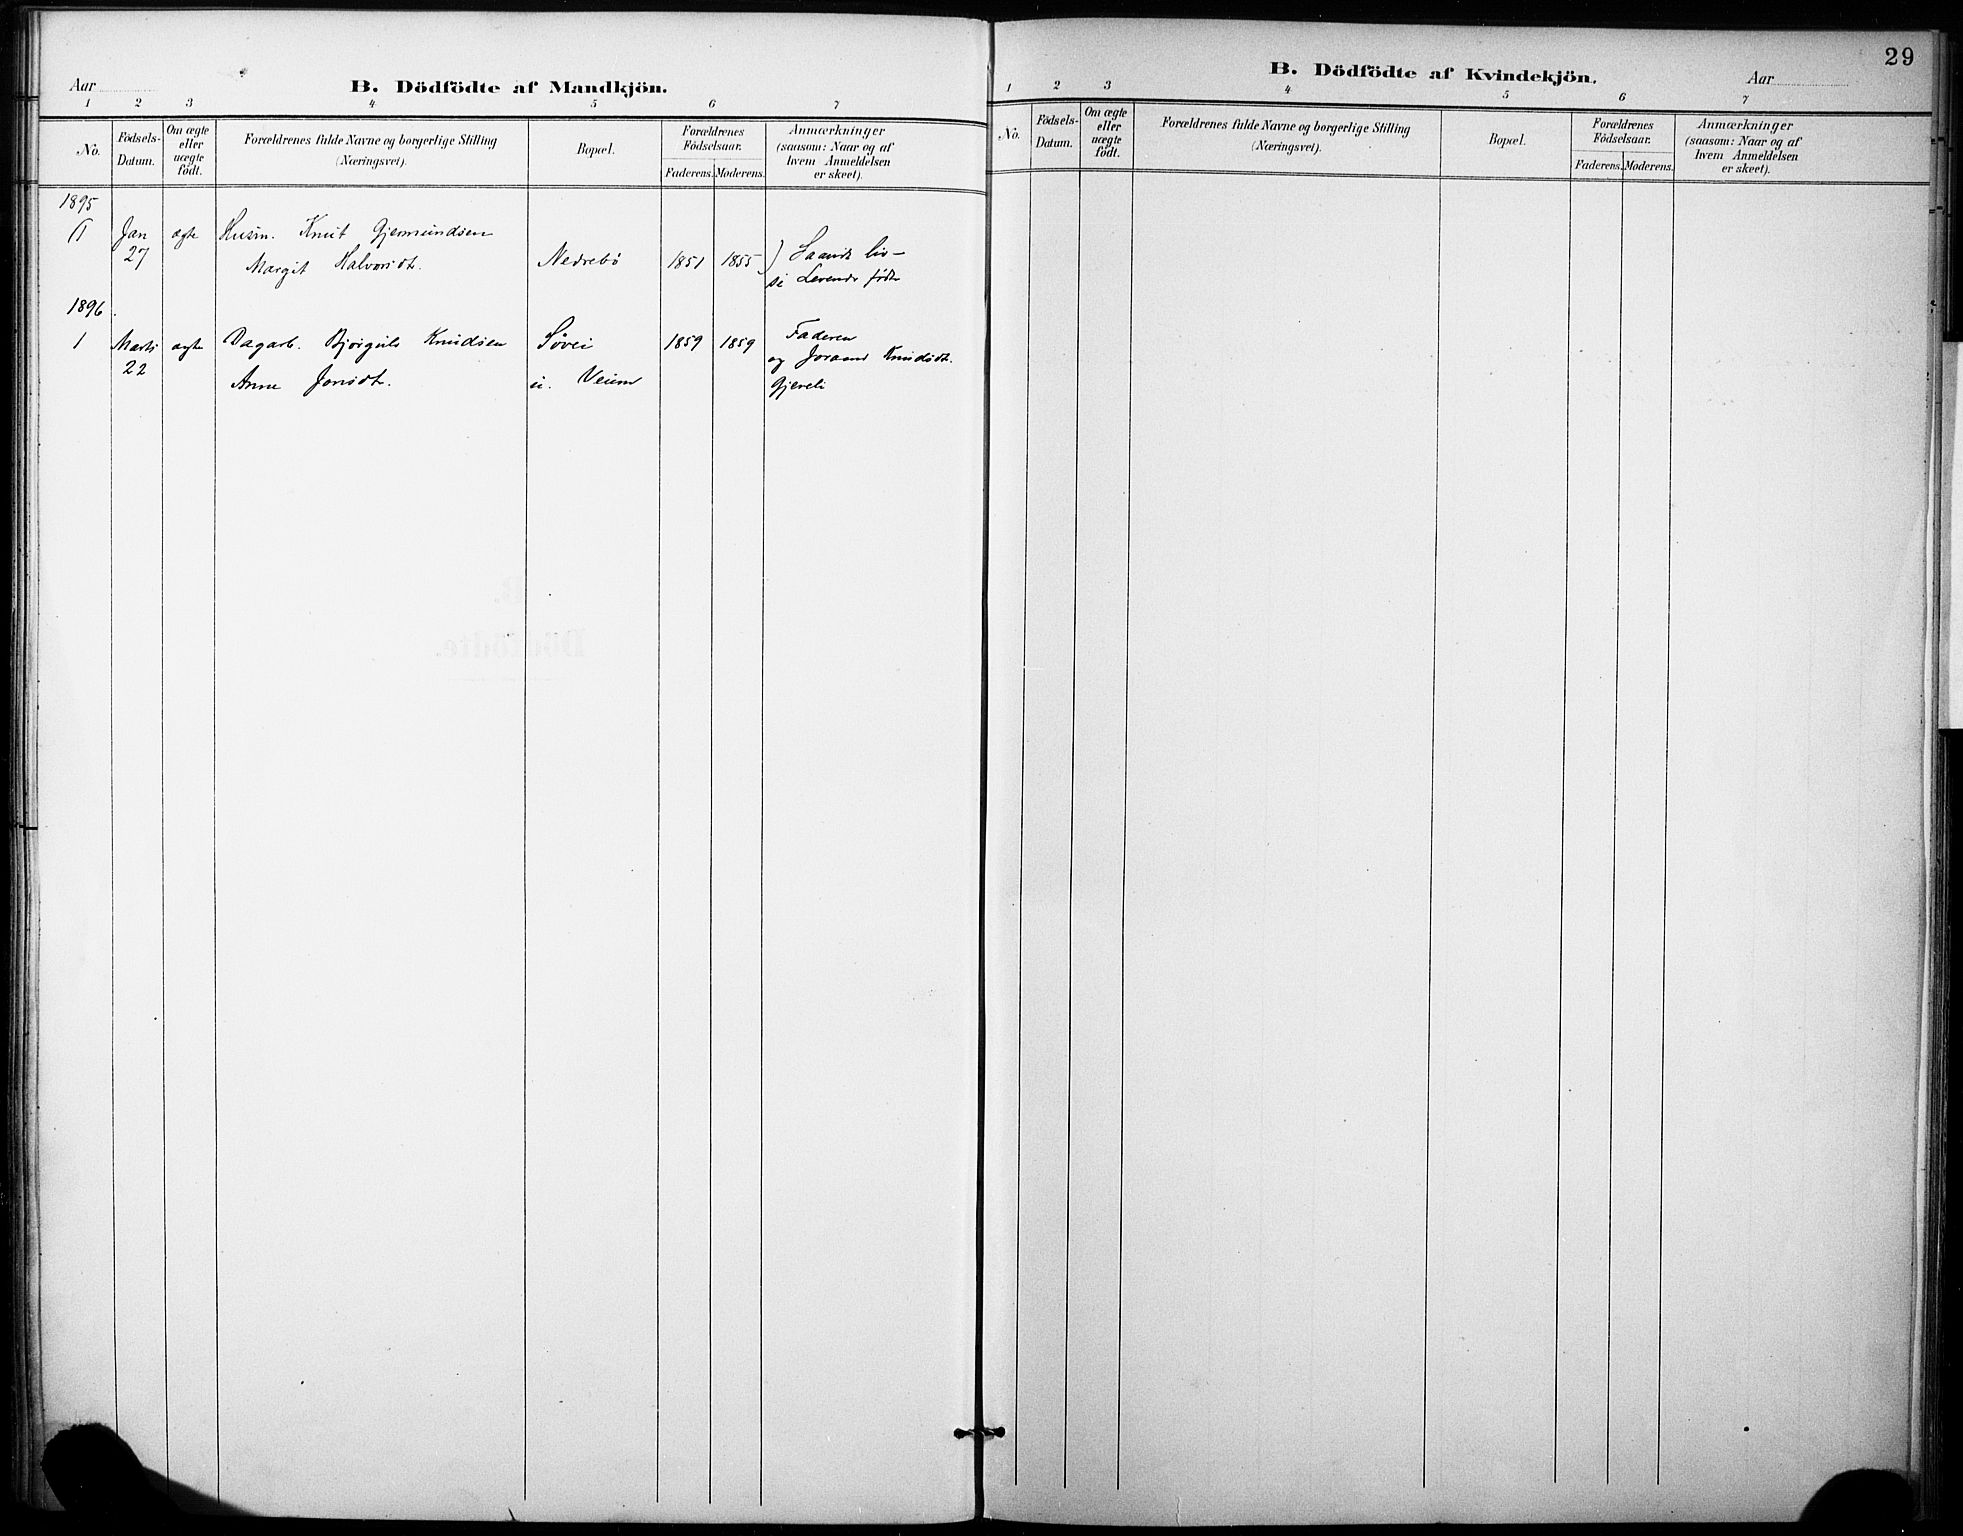 SAKO, Fyresdal kirkebøker, F/Fb/L0003: Ministerialbok nr. II 3, 1887-1903, s. 29